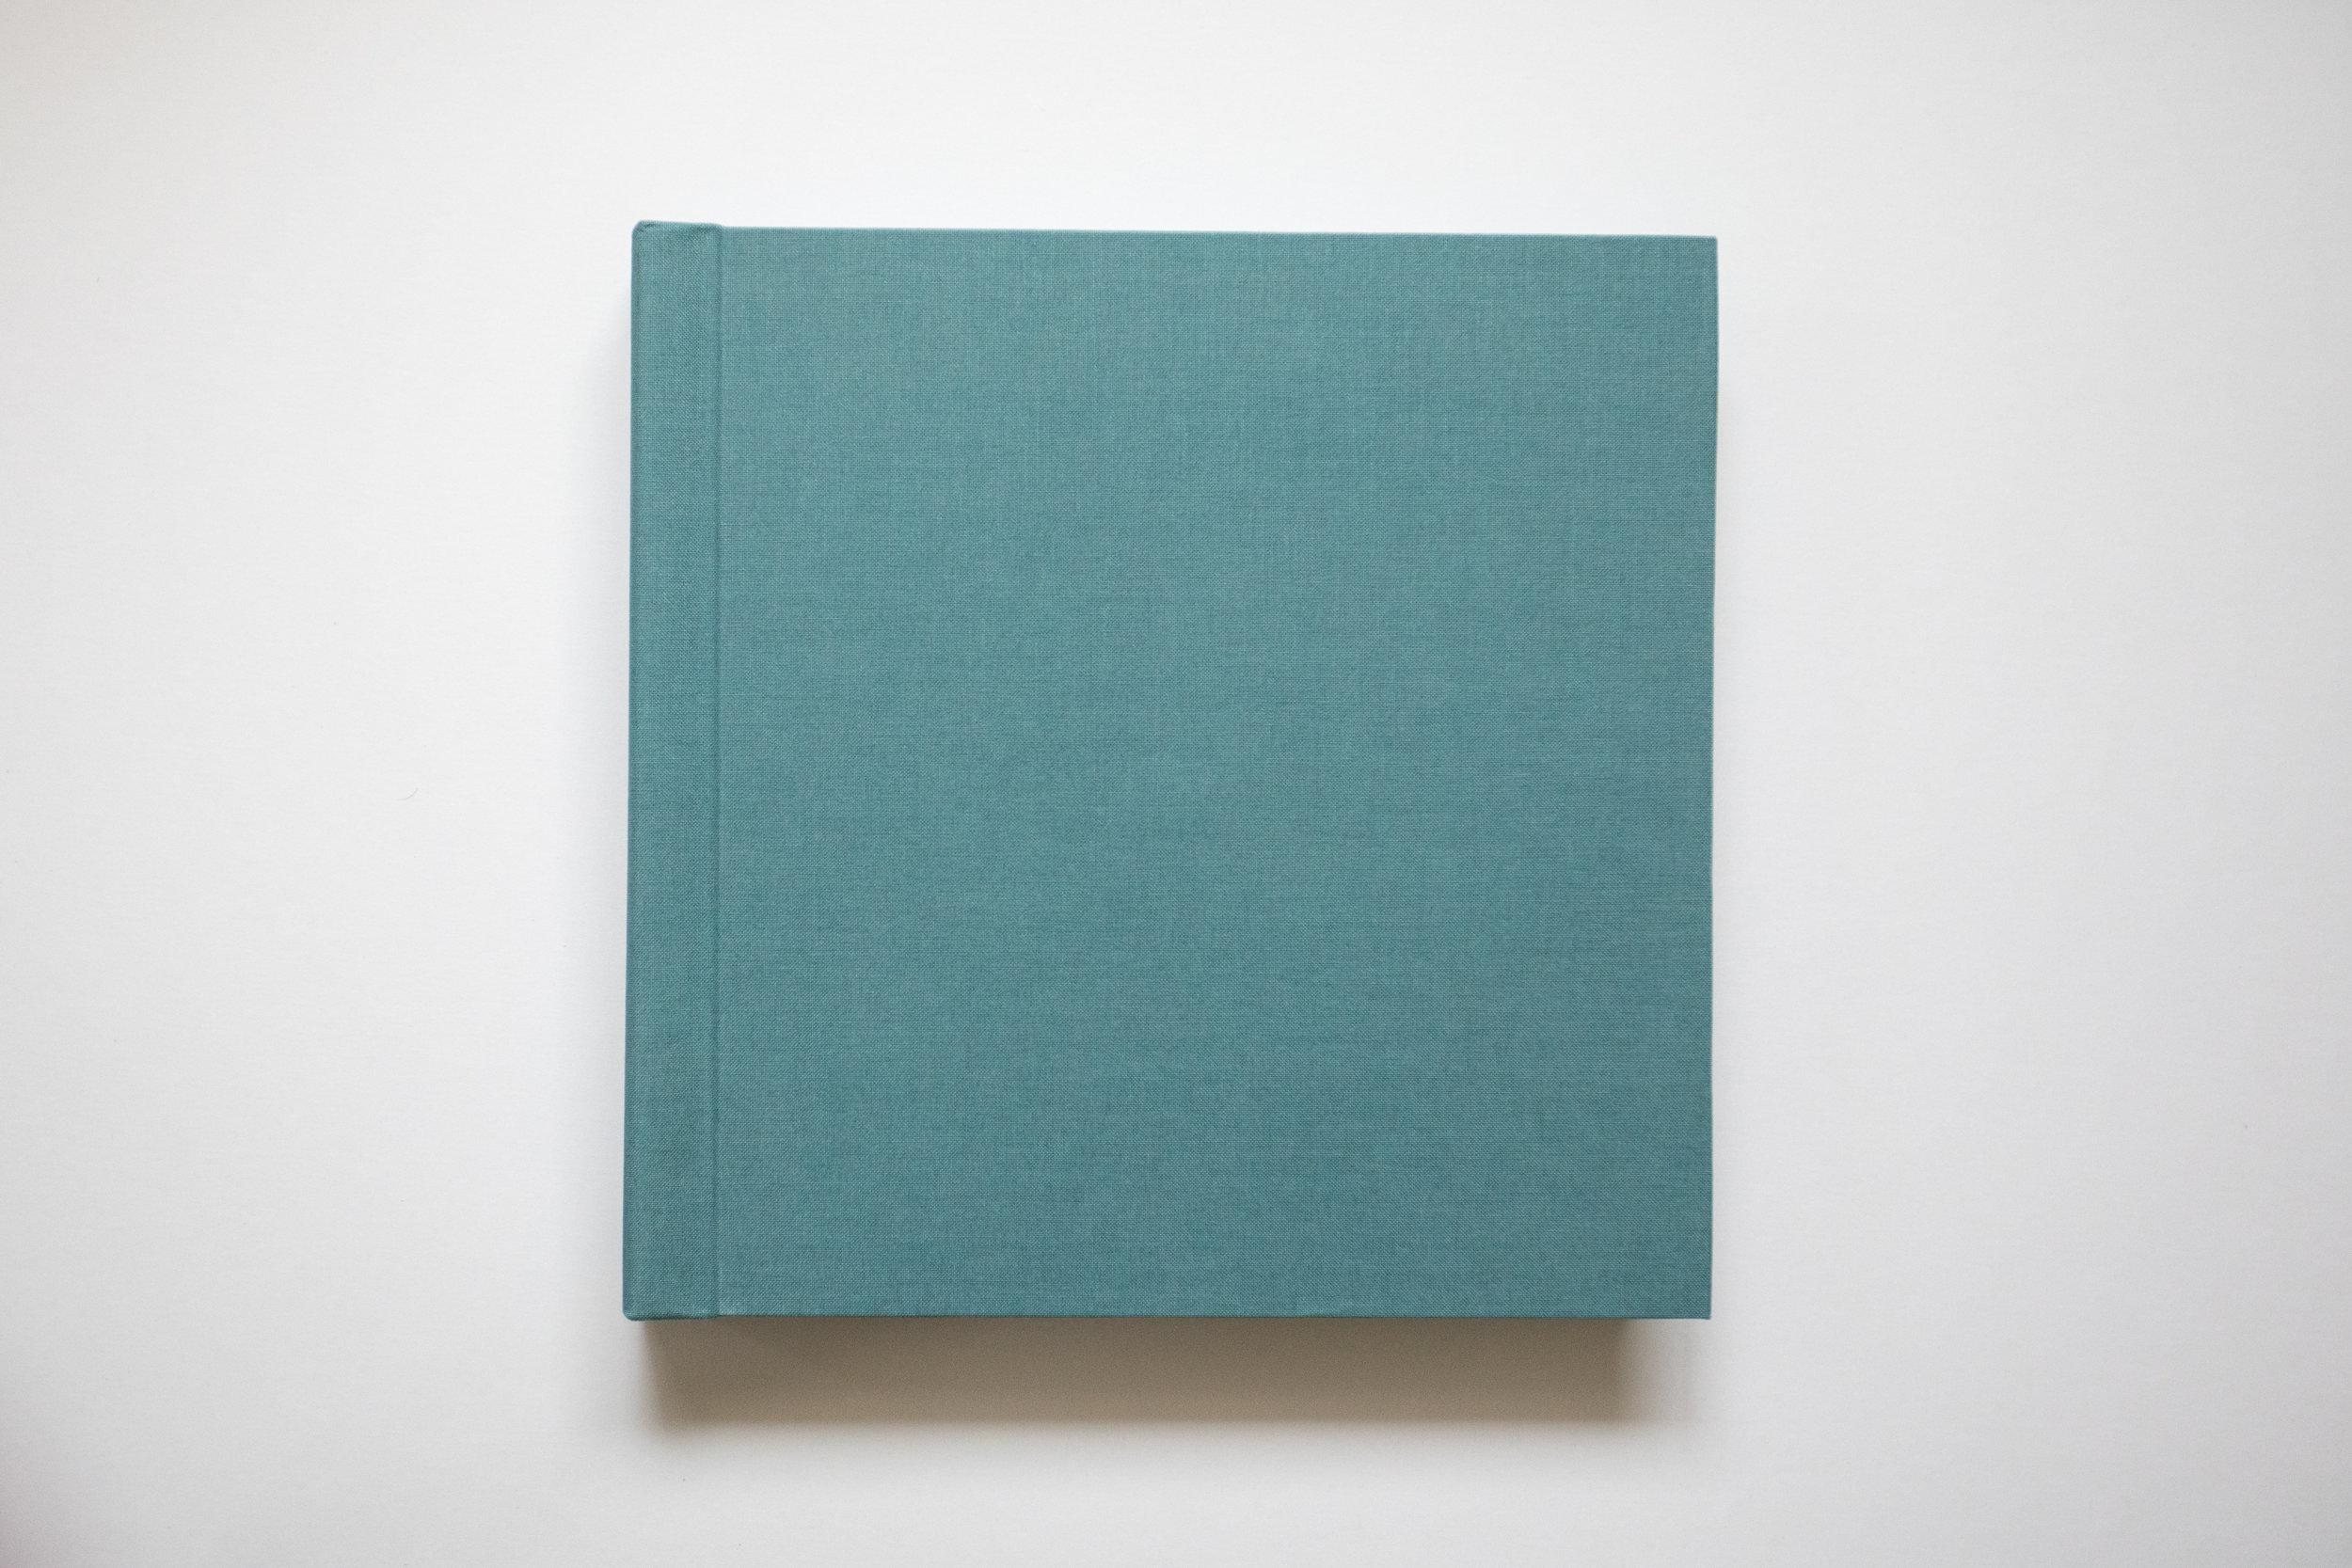 10 x 10 Teal Linen Cover Album